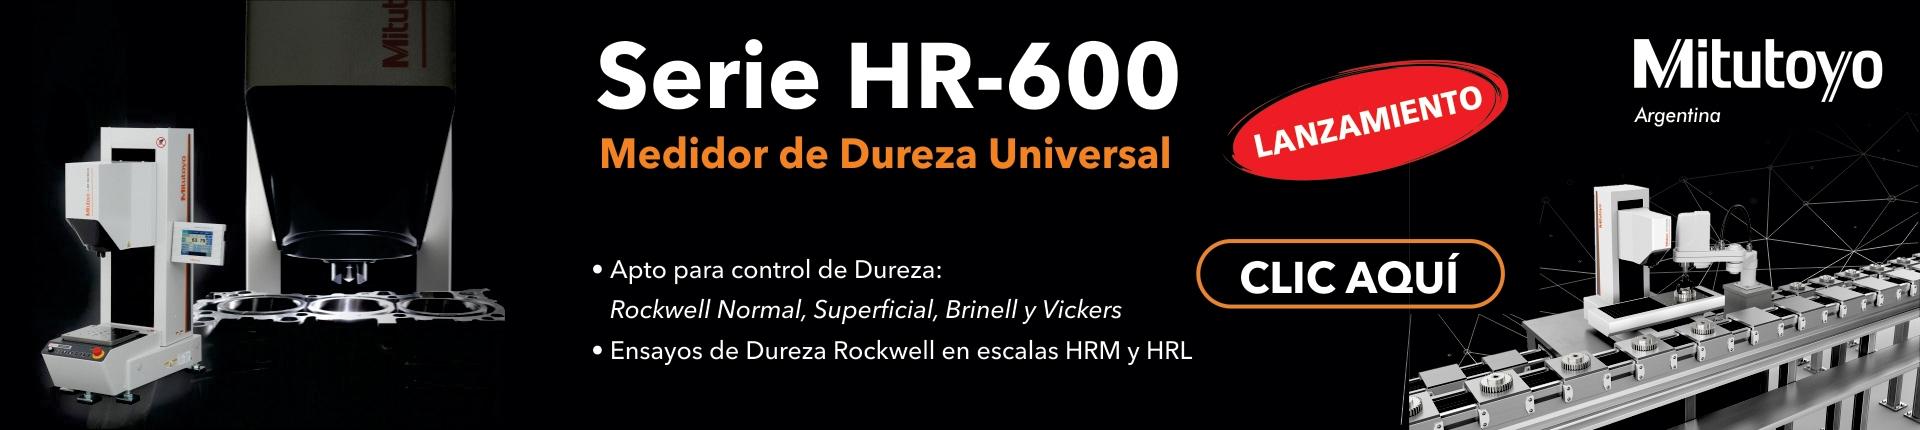 HR-600